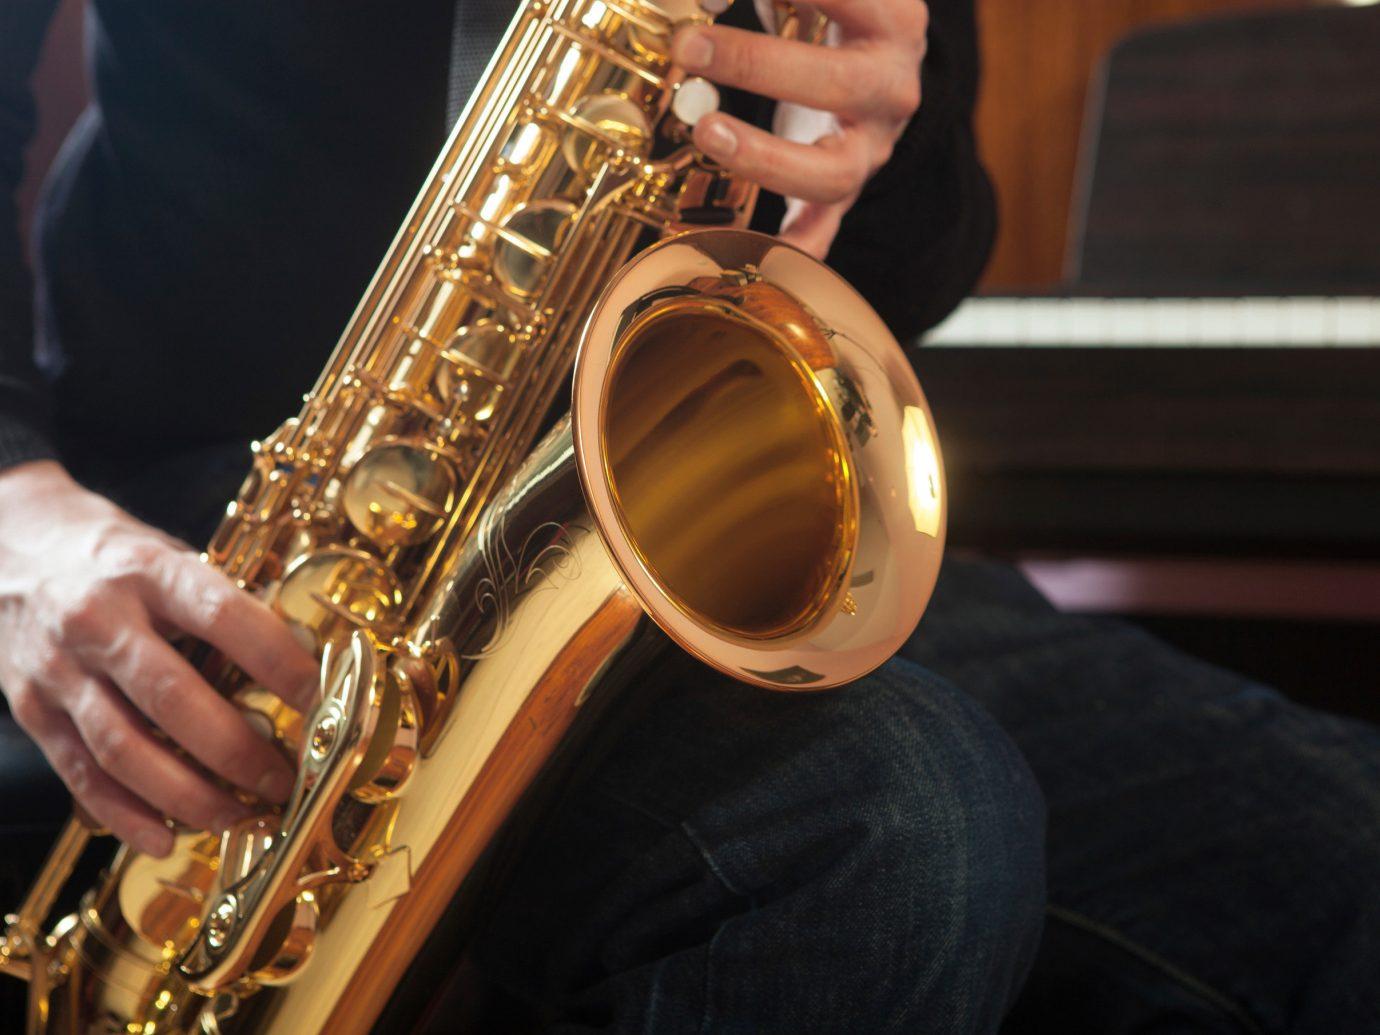 Trip Ideas person Music saxophone saxophonist indoor slide guitar brass musical instrument string instrument baritone saxophone woodwind instrument bassist euphonium tuba brass instrument wind instrument bass guitar reed instrument jazz guitar sax